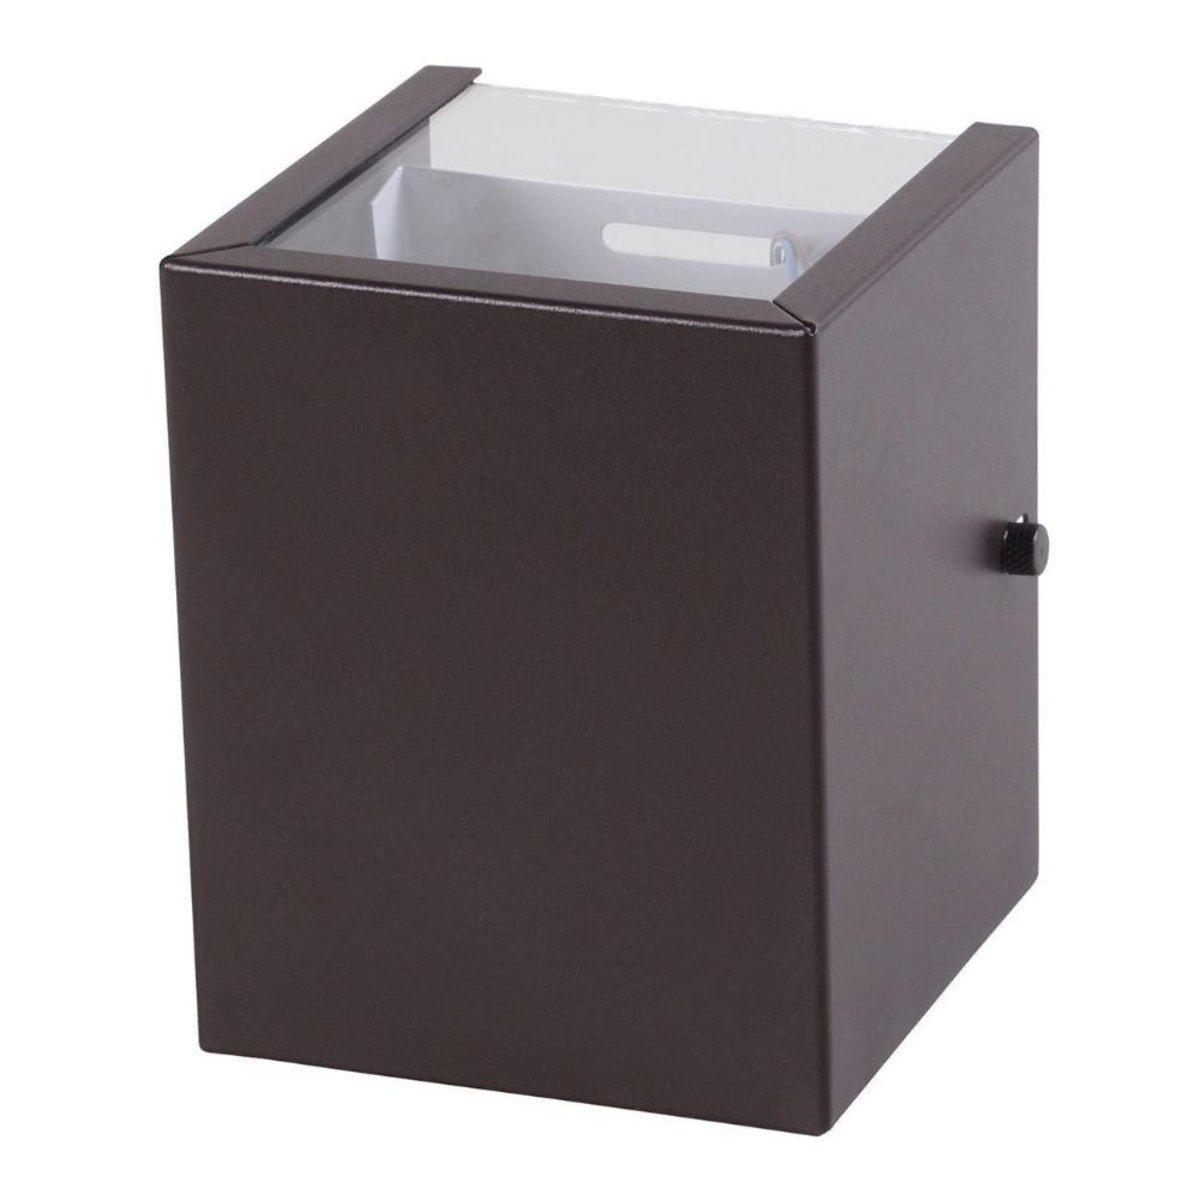 Arandela Box 2 Focos Marrom 1G9 10x12cm Externa